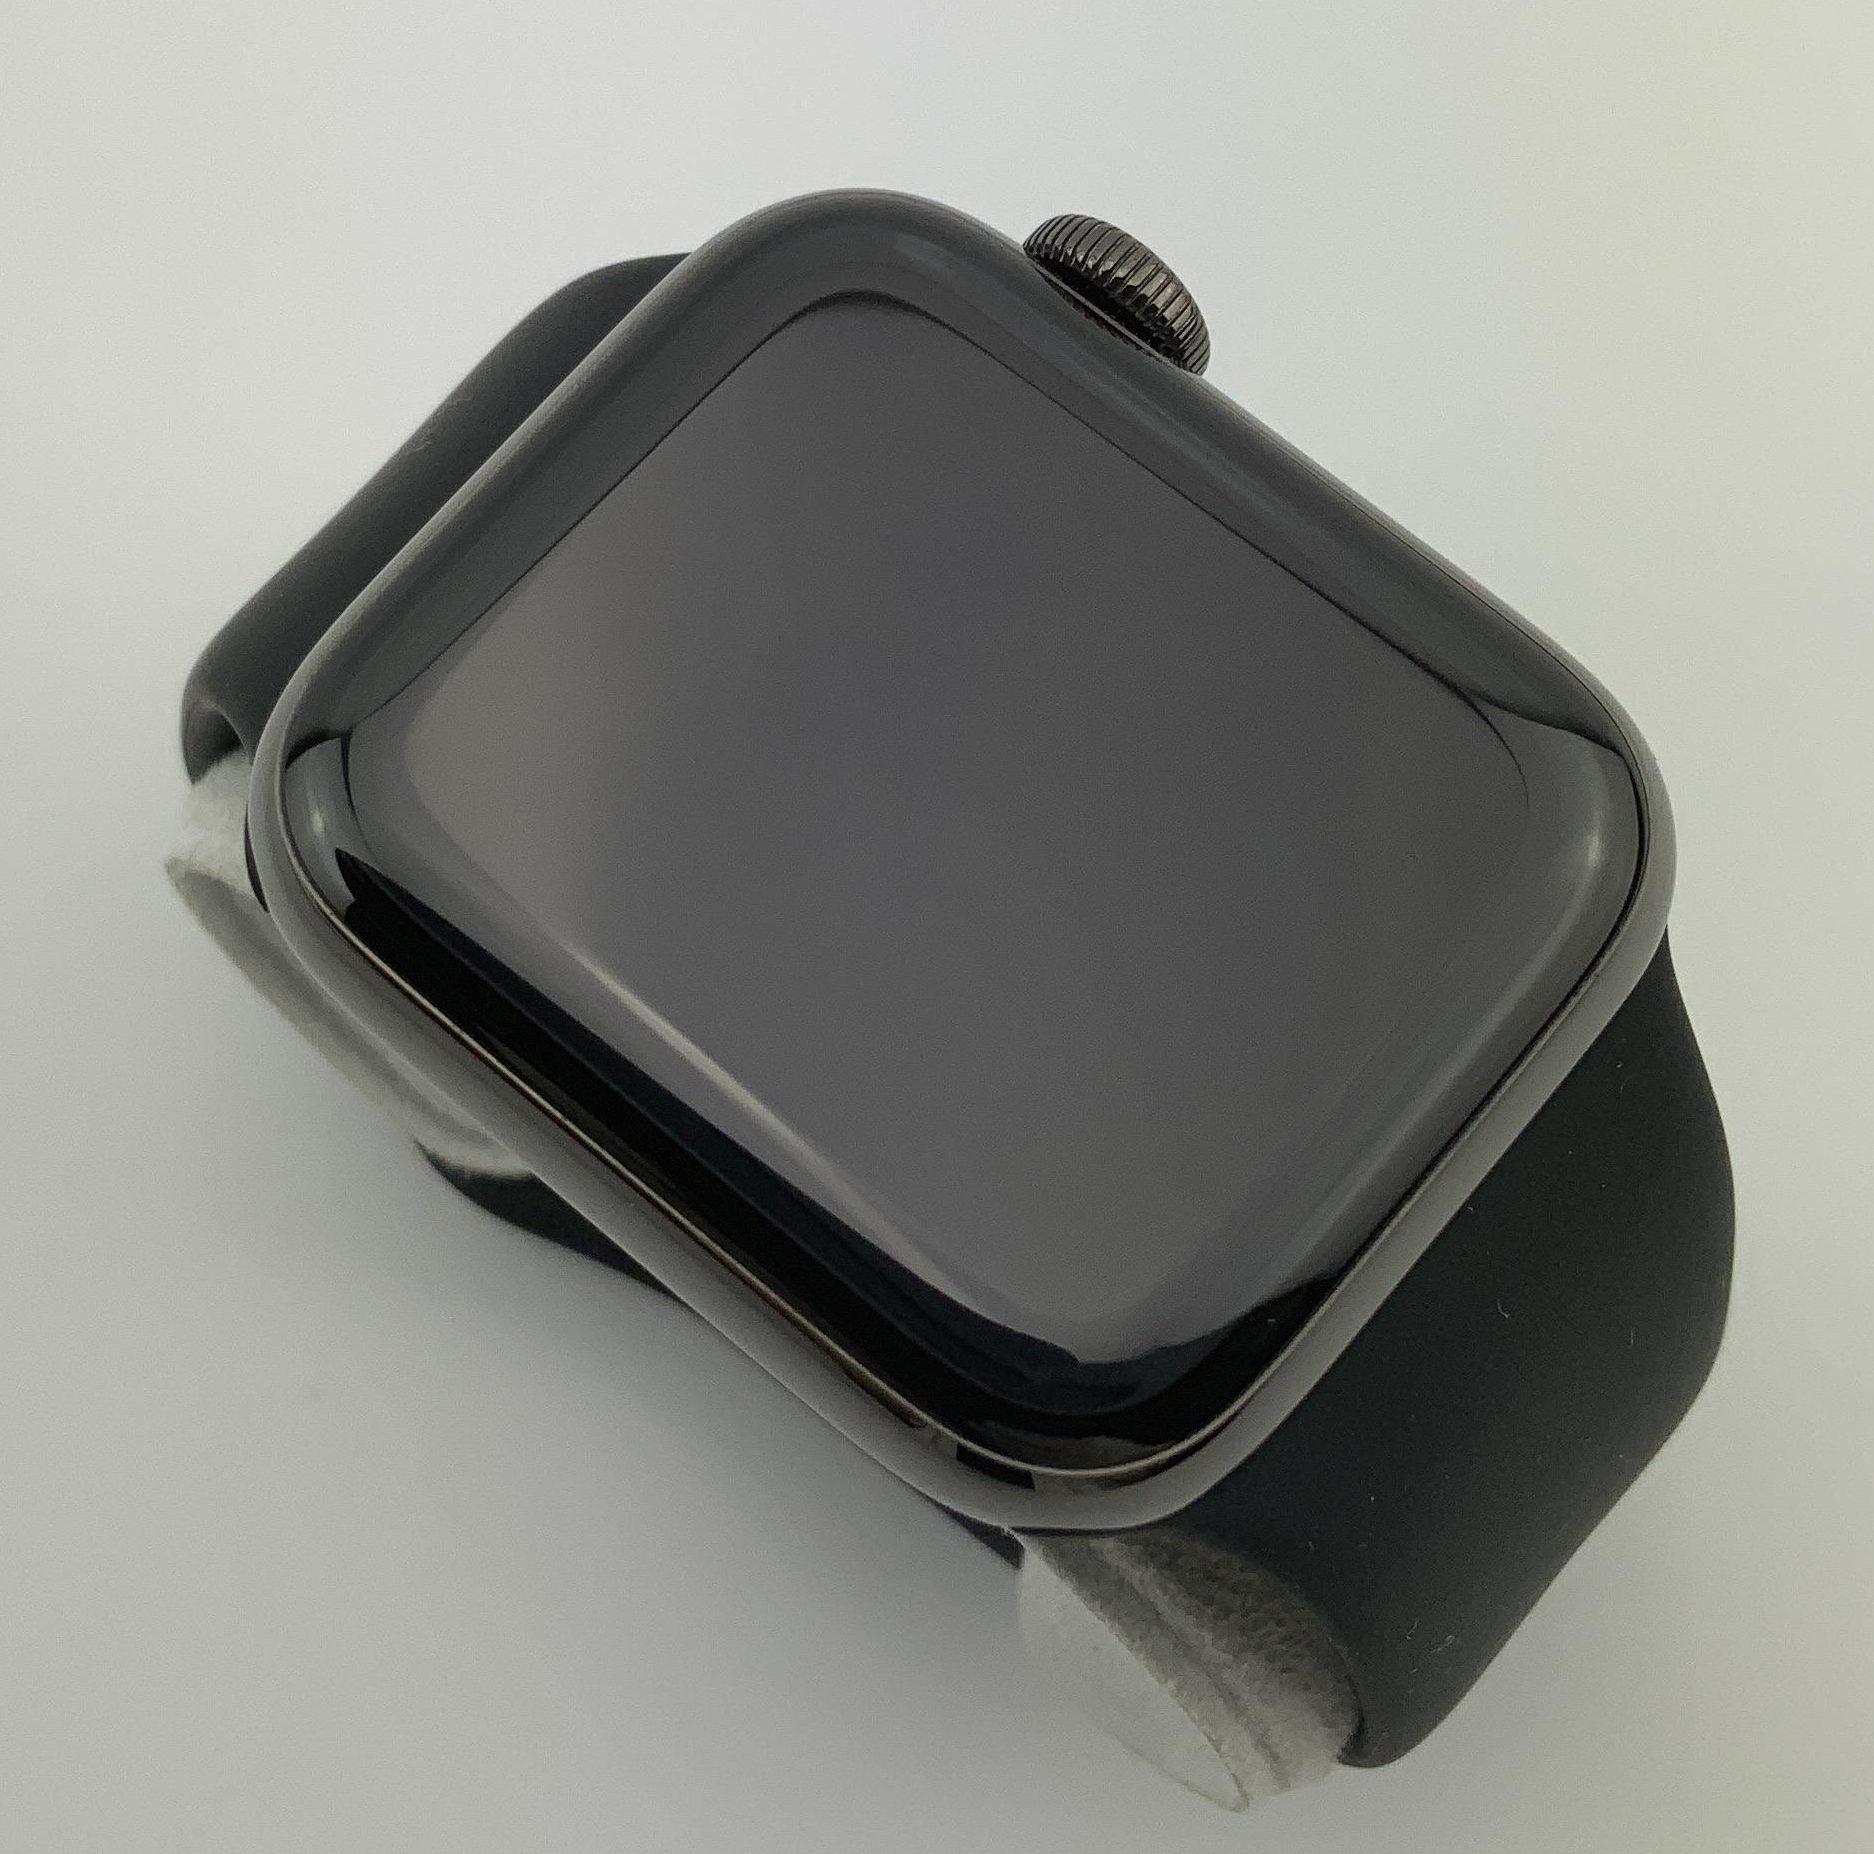 Watch Series 6 Steel Cellular (40mm), Graphite, Kuva 2